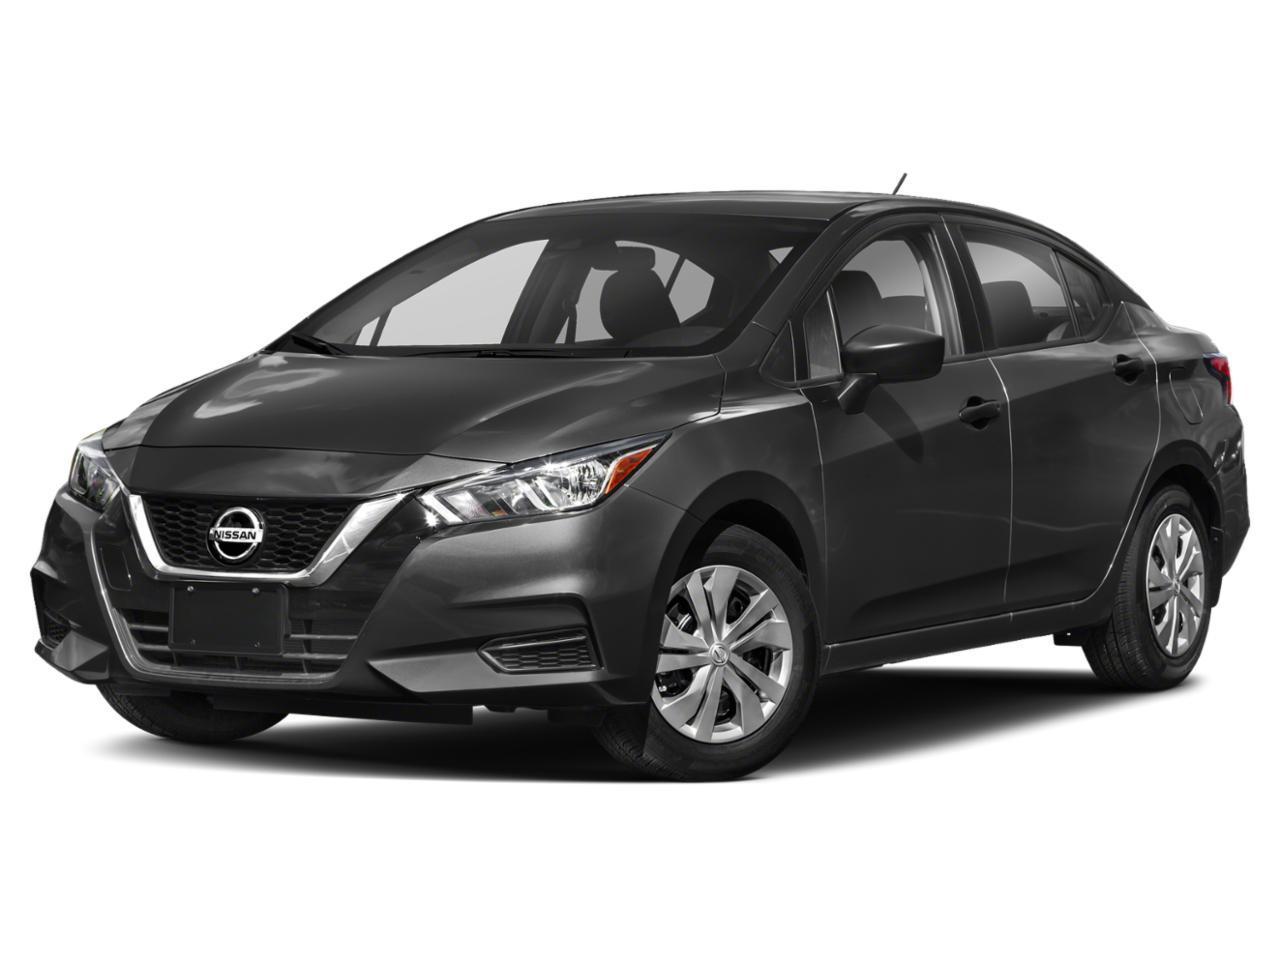 Baton Rouge Gun Metallic 2020 Nissan Versa New Car For Sale Ew51518